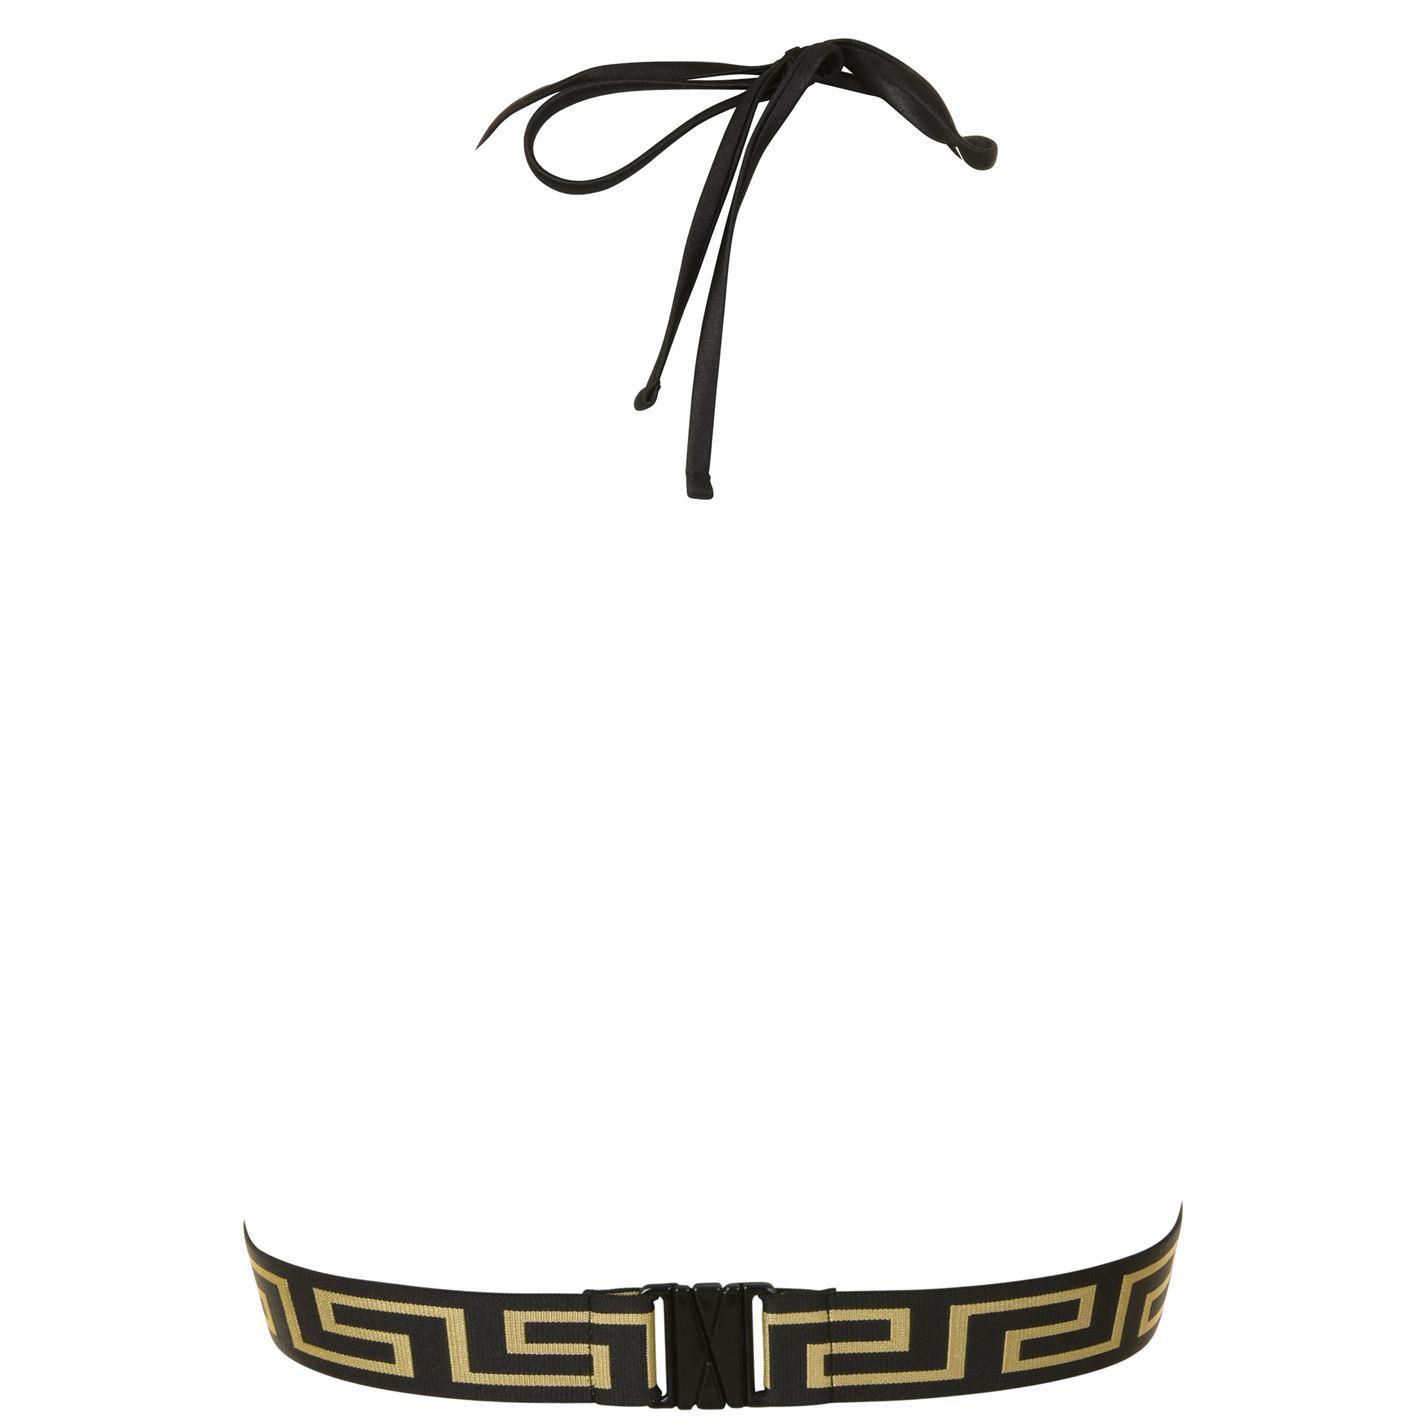 63d5739dfc Versace Greca Band Bikini Top in Black - Lyst